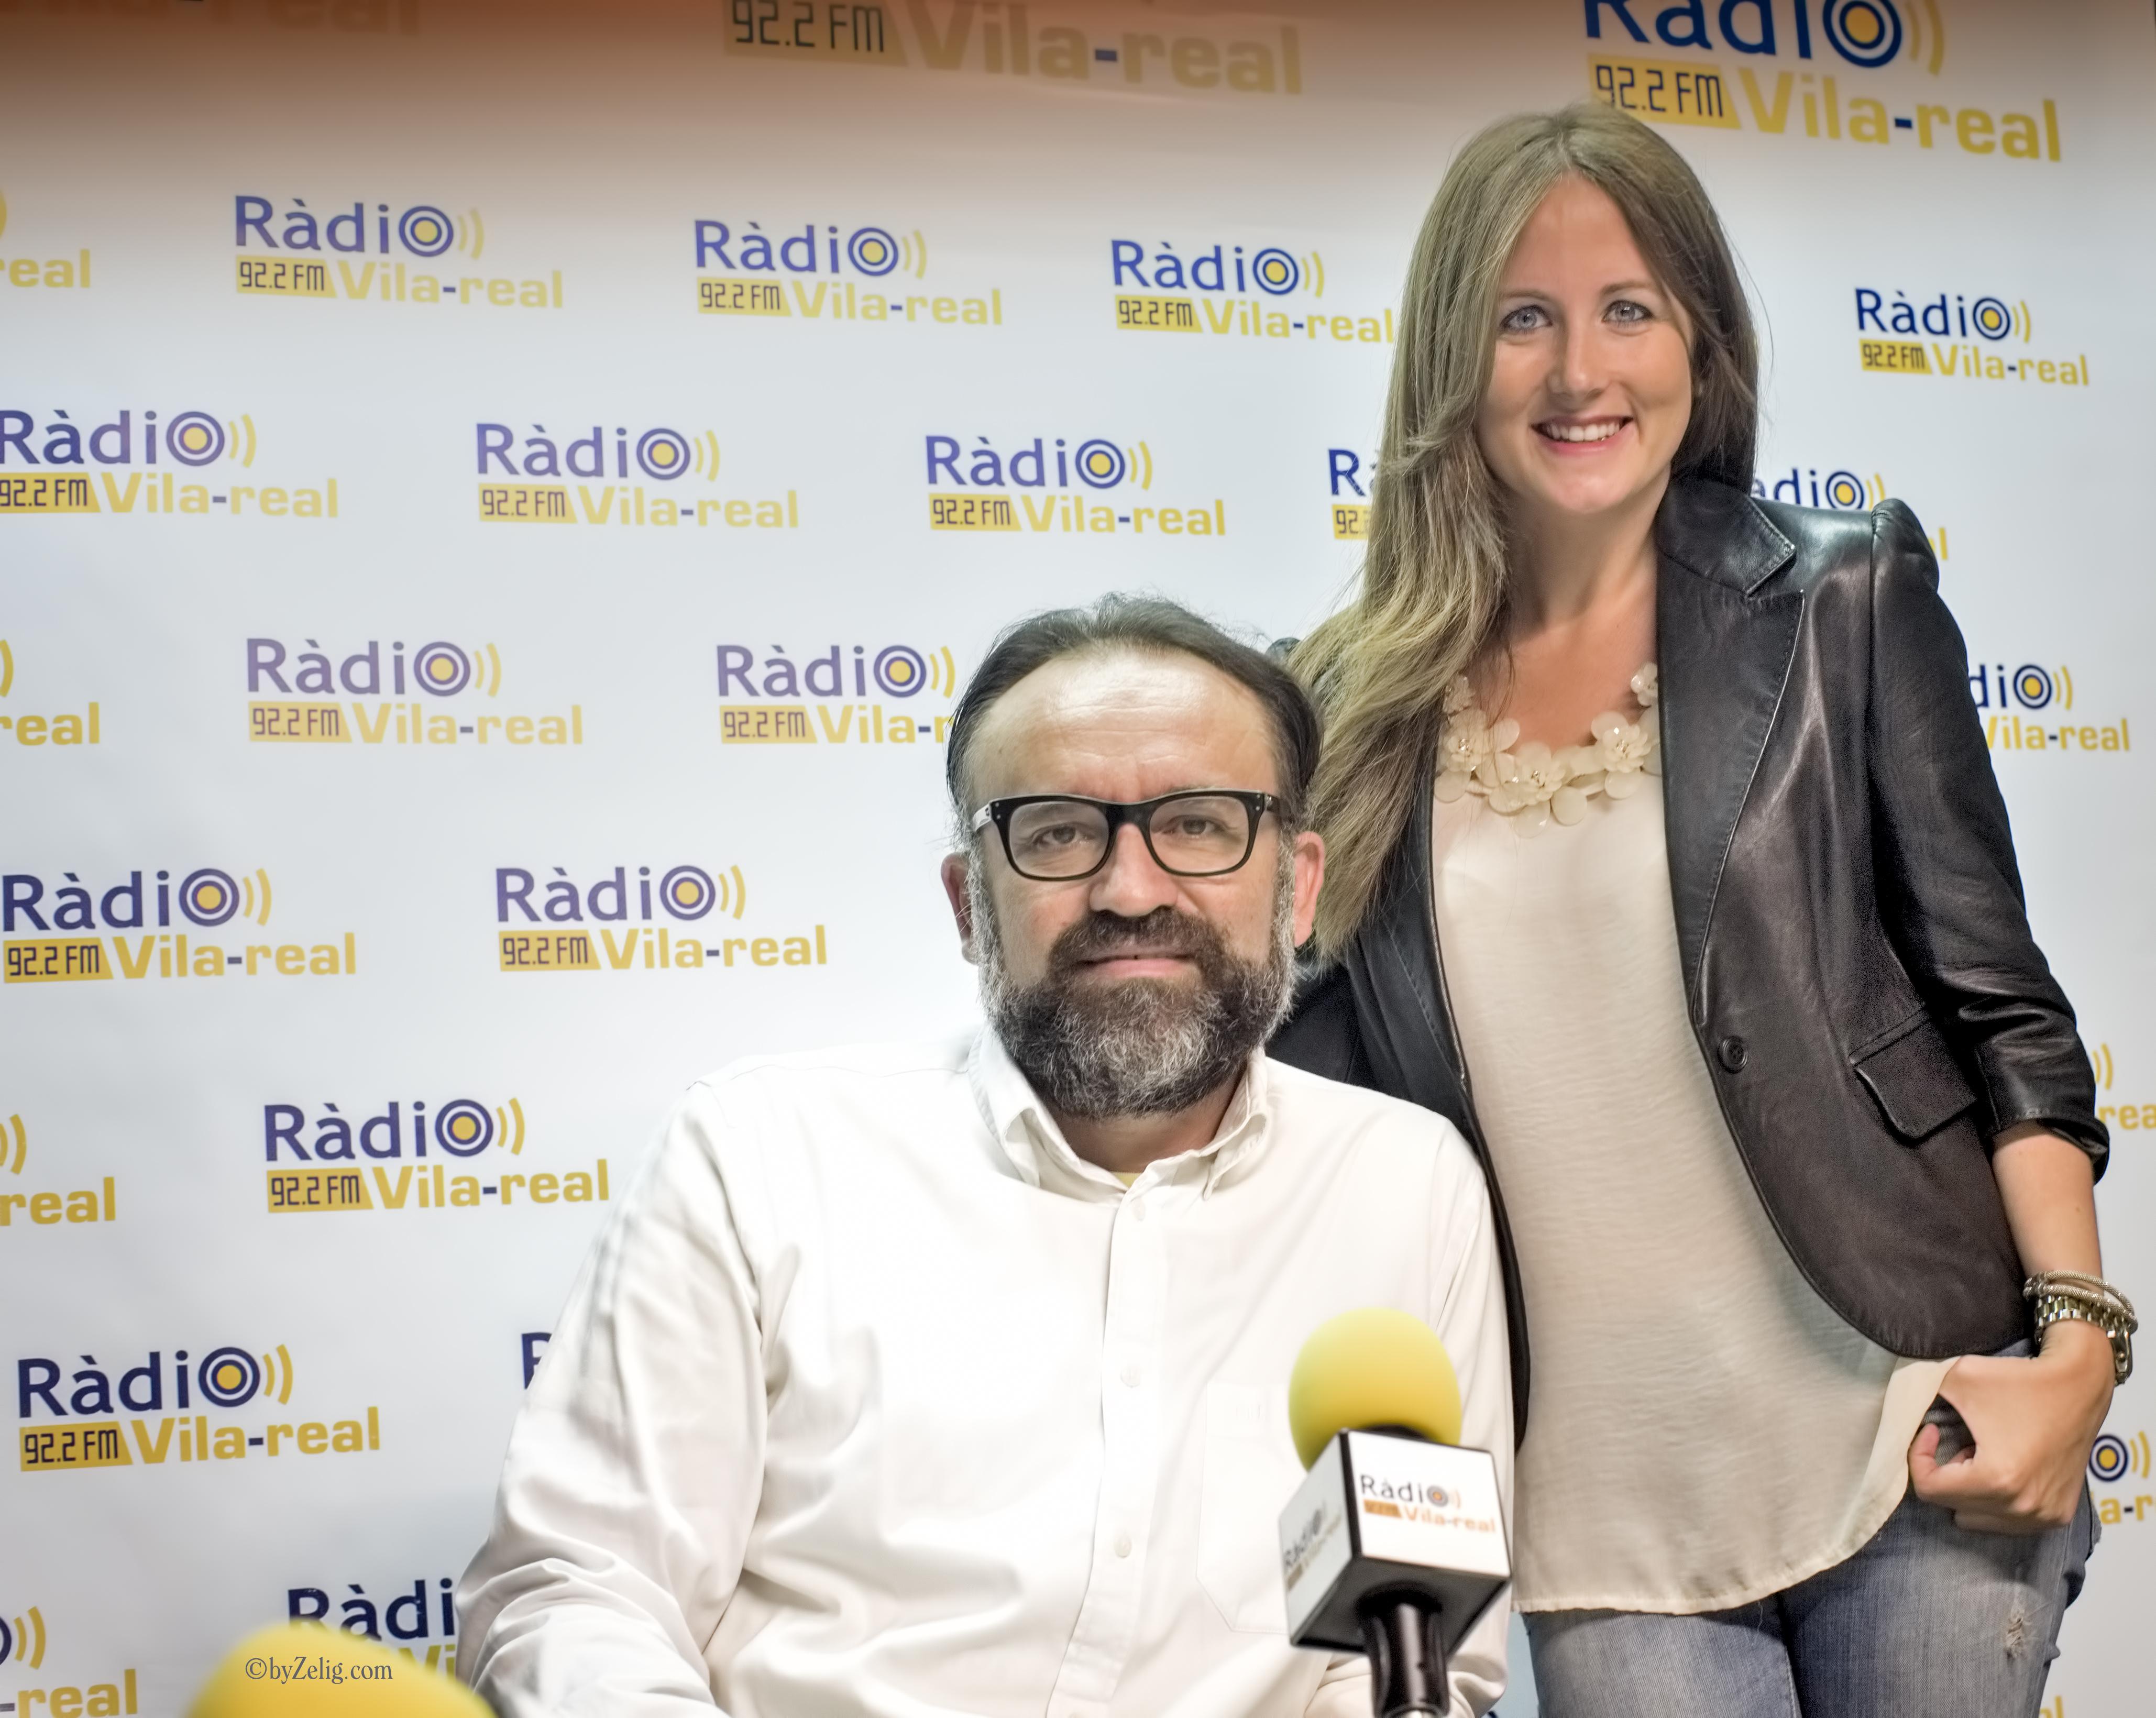 Esports Radio Vila-real. Programa del 10 de febrero de 2017